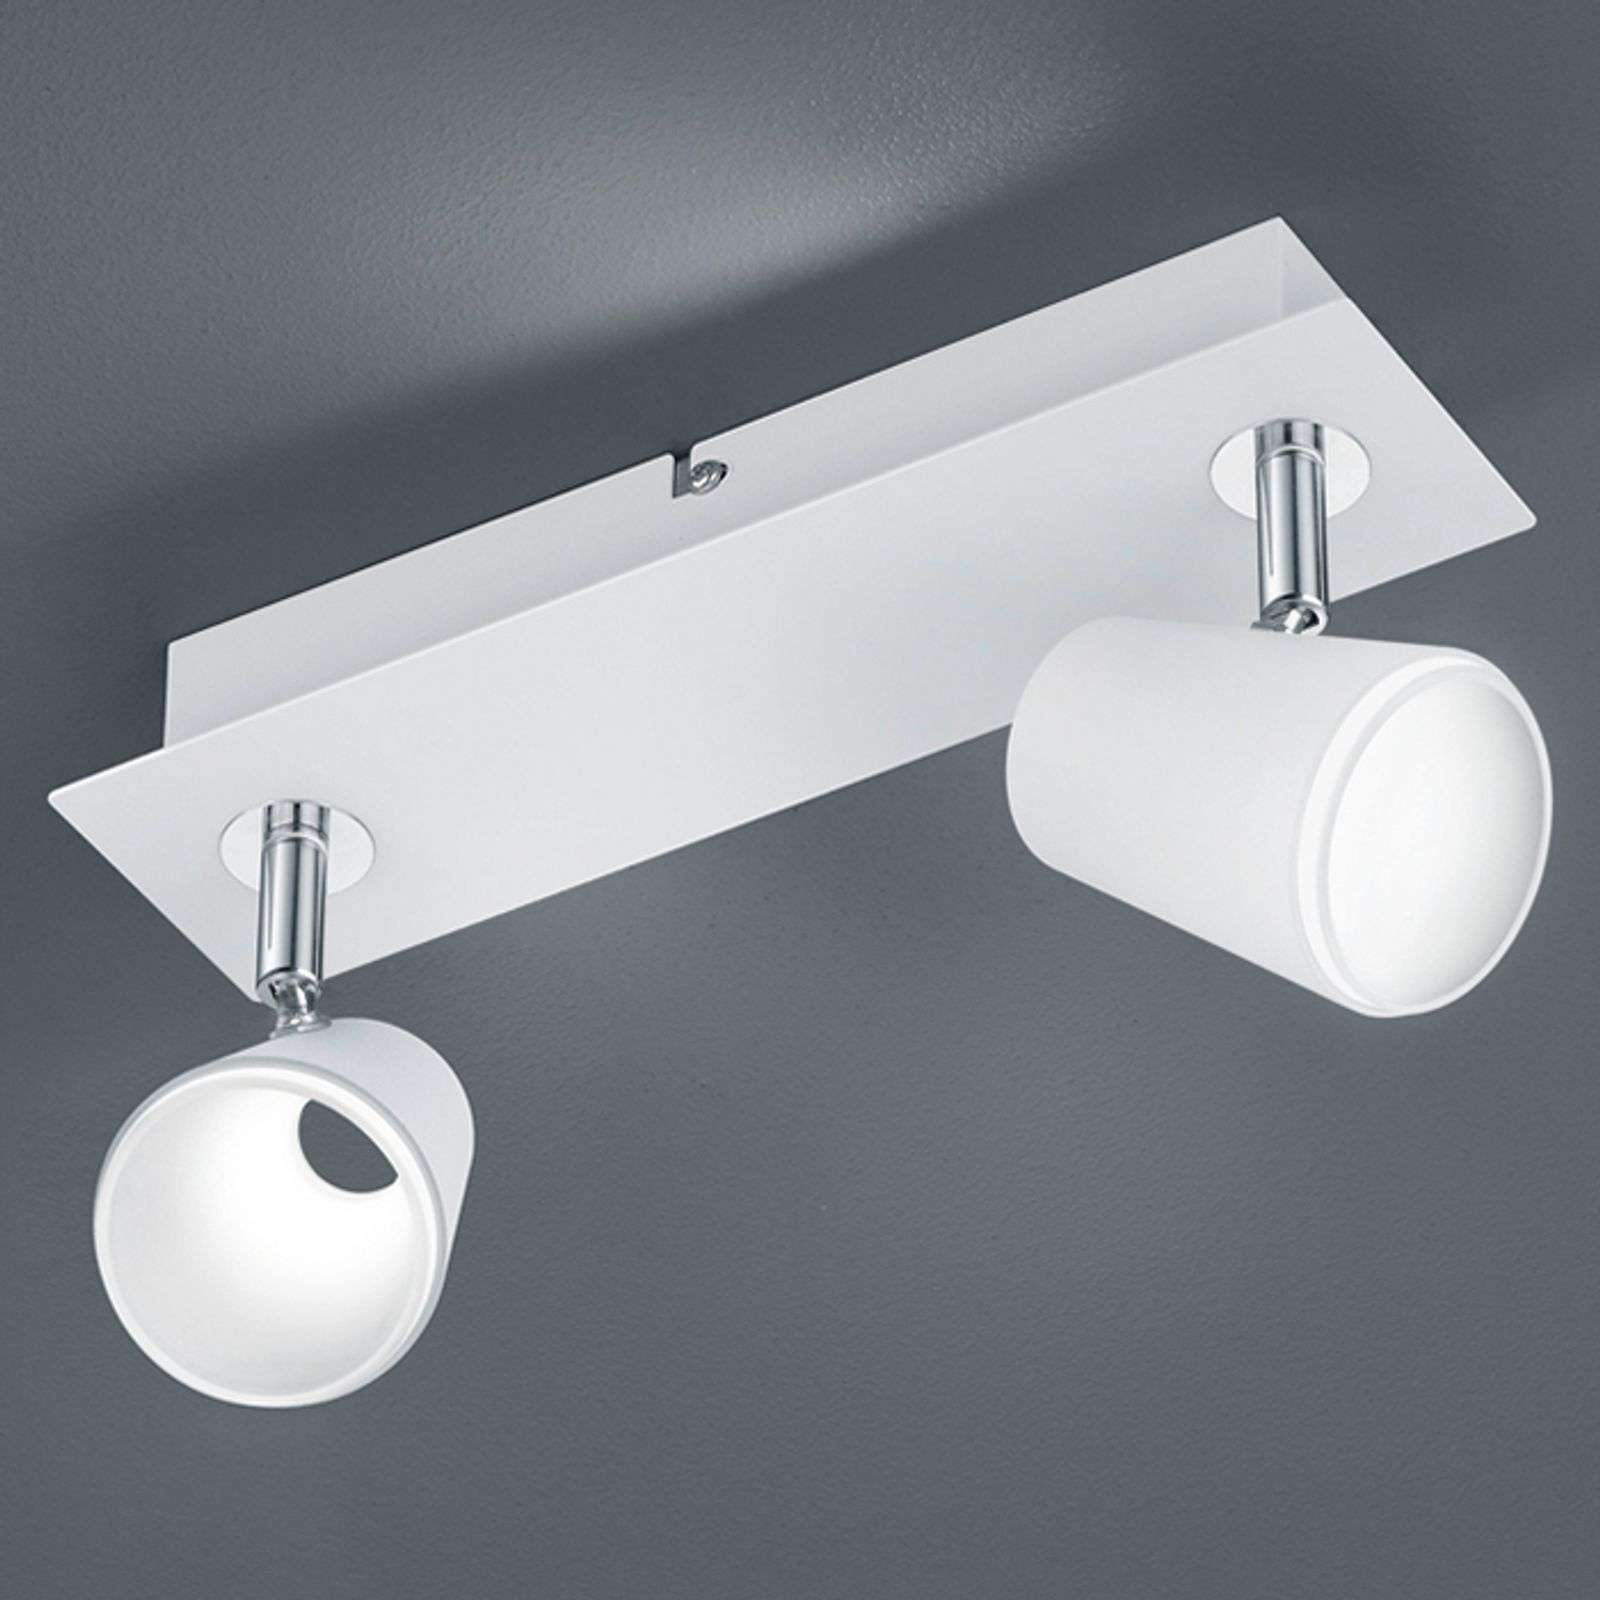 Dimmbare Led Spots Flackern Led Lamp Spot Dimbaar Led Spots Dimbaar Buiten Inbouwspot Buiten Gu10 Led Inbouwspot In 2020 Moderne Lampen Led Moderne Verlichting